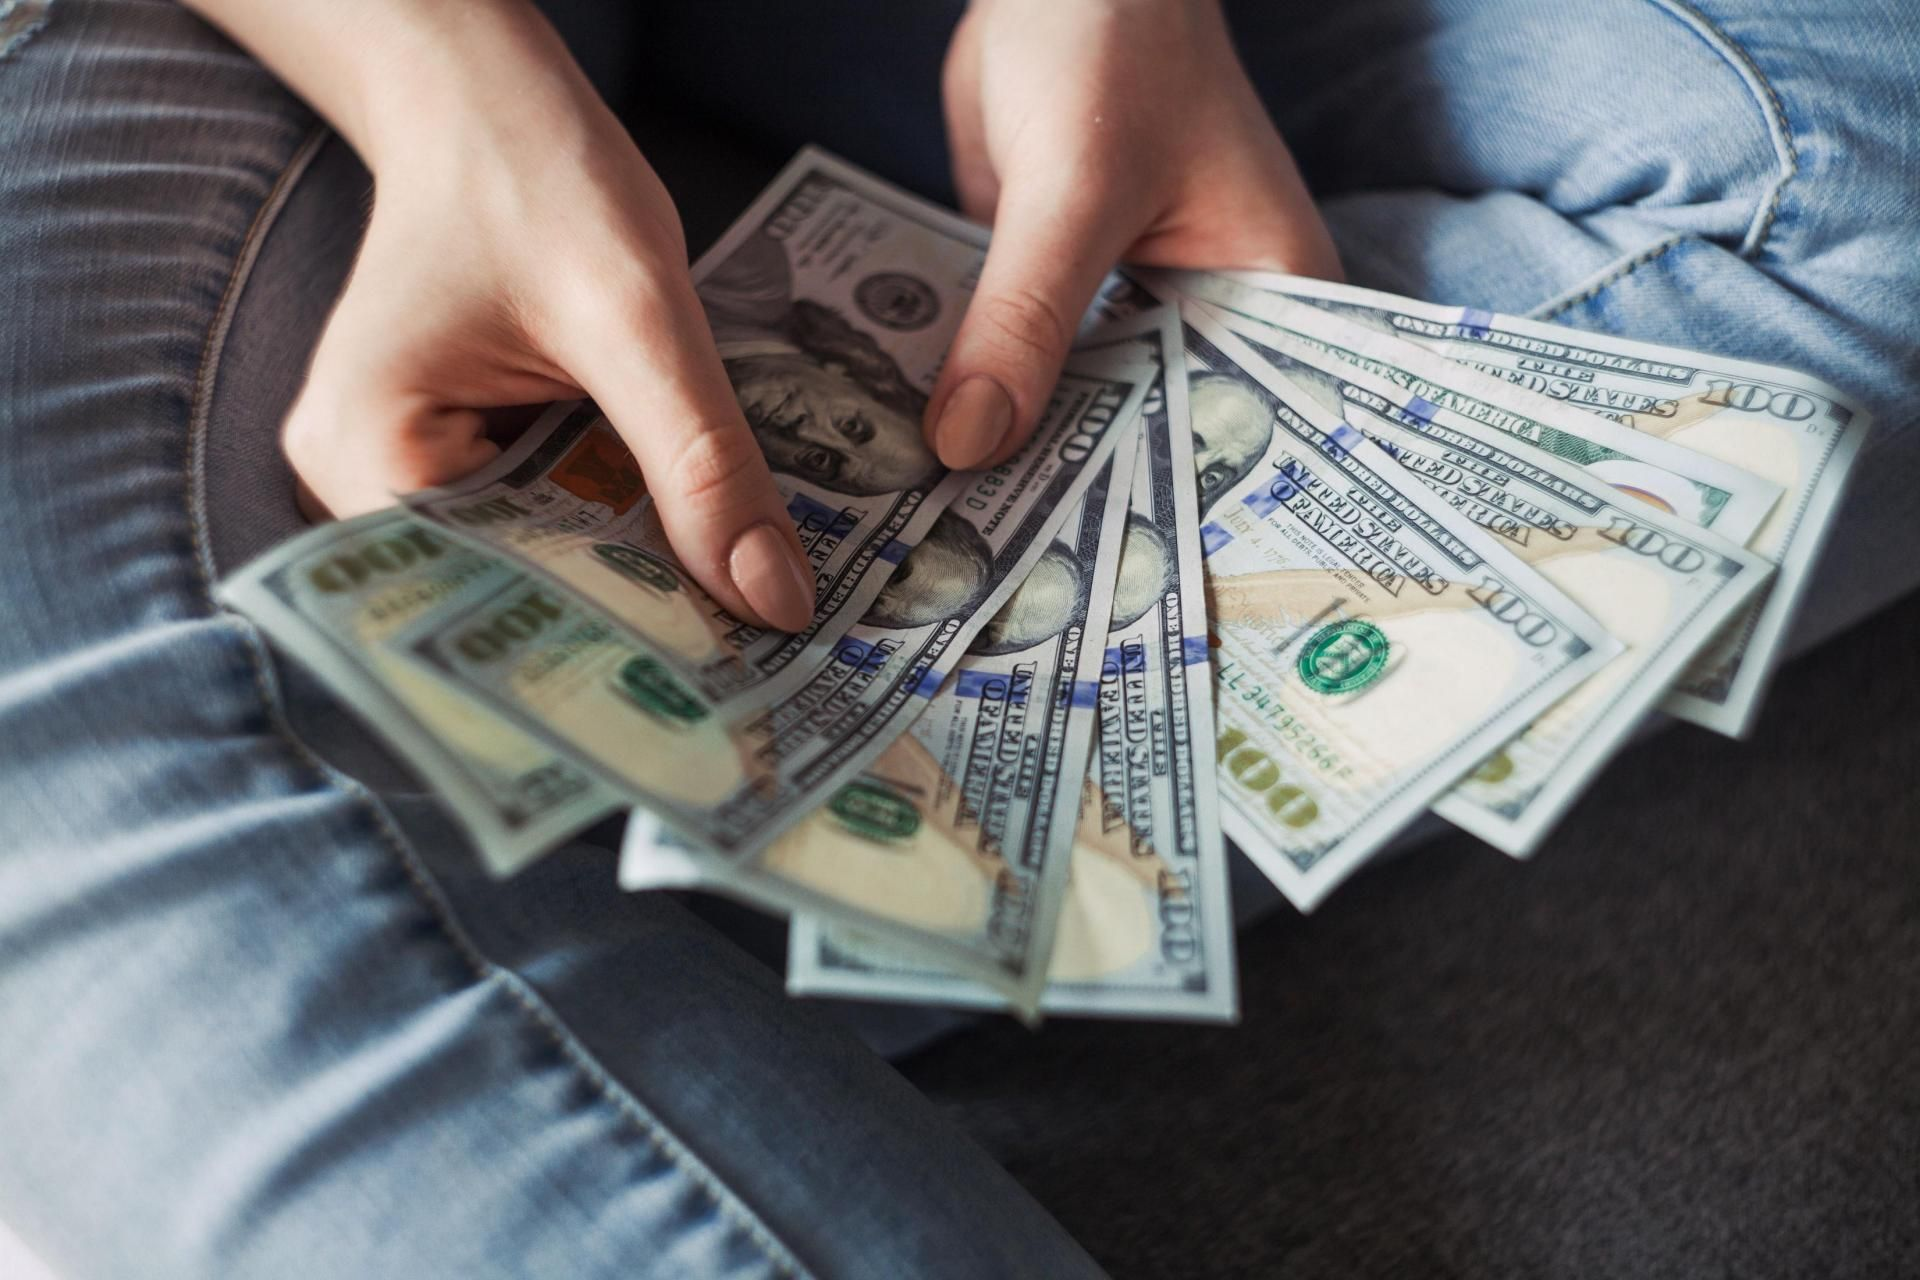 84% Of Apartment Renters Have Paid April Rent